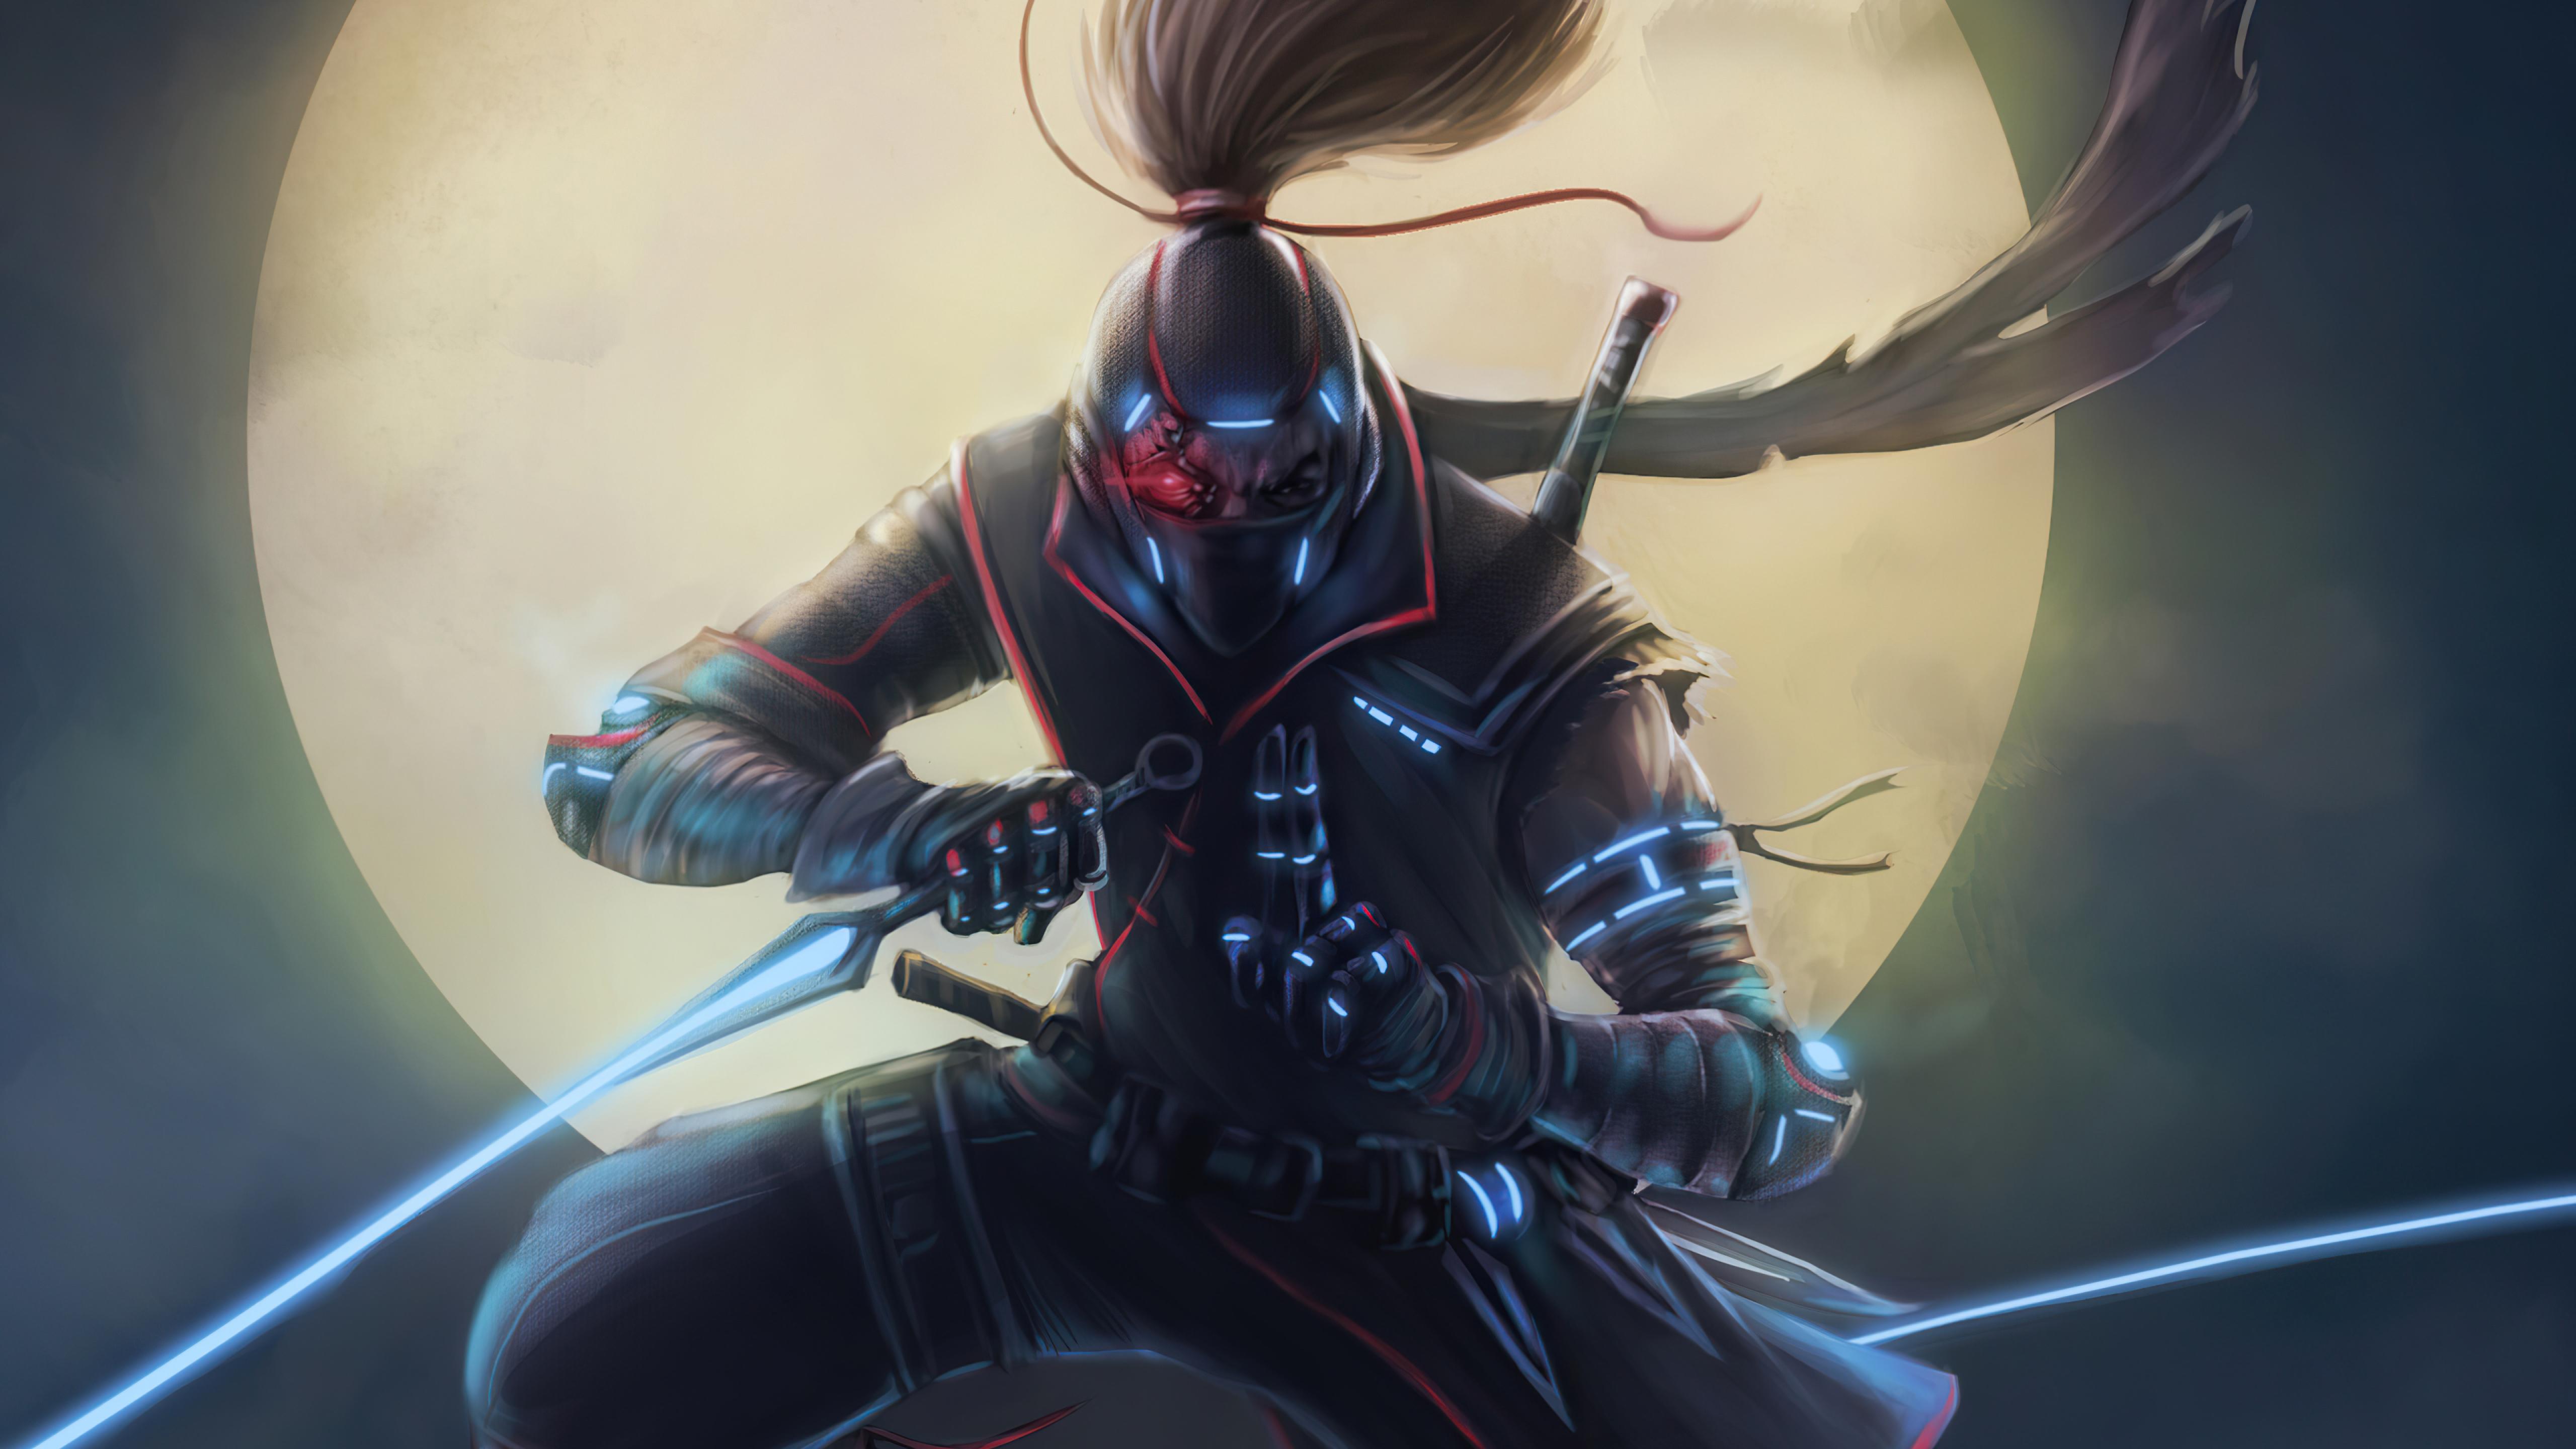 5120x2880 Cyberpunk Ninja Warrior 5K Wallpaper, HD Artist ...